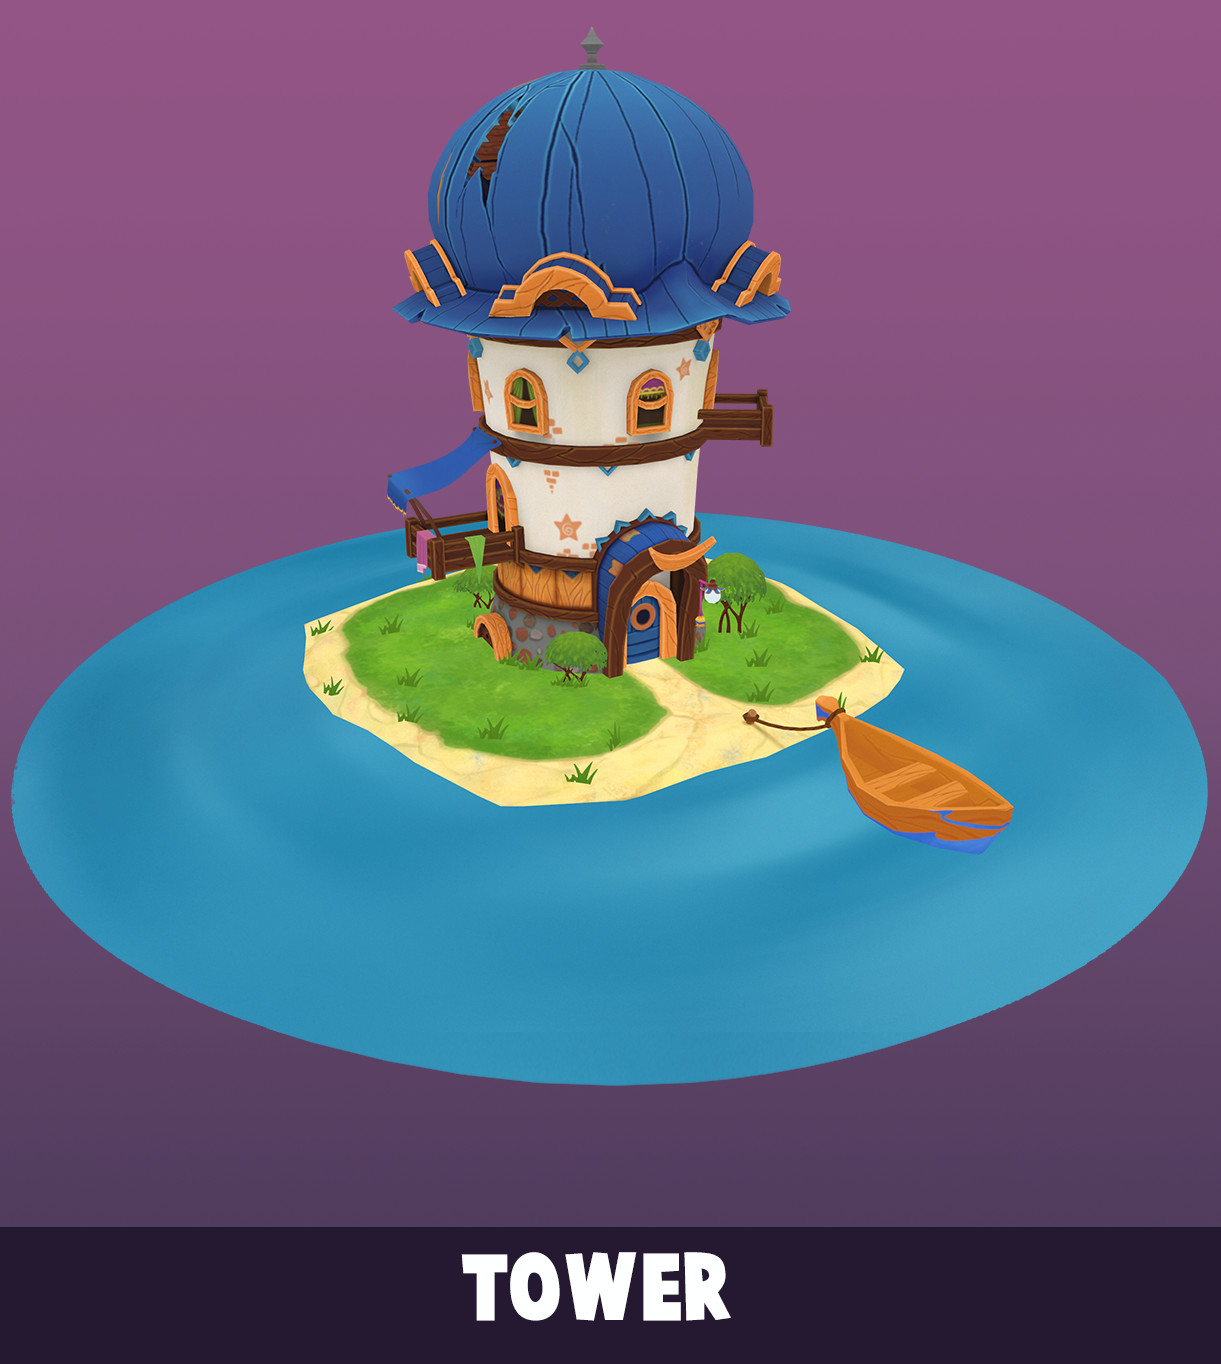 Caio perez torre render1